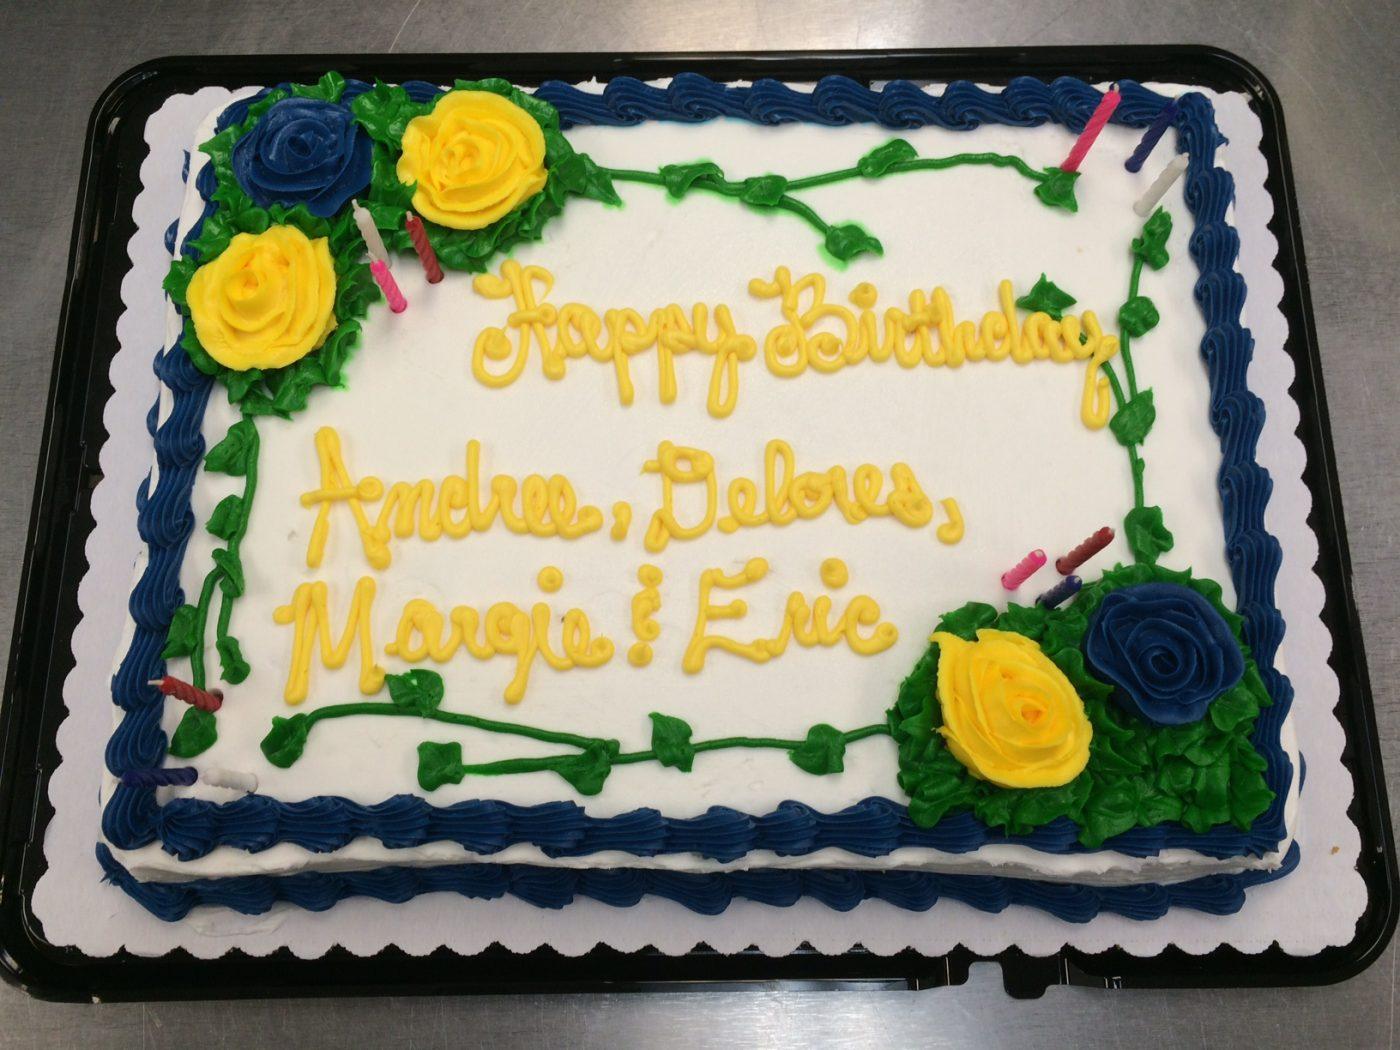 The Rockwood Celebrates August Birthdays St Louis Senior Living